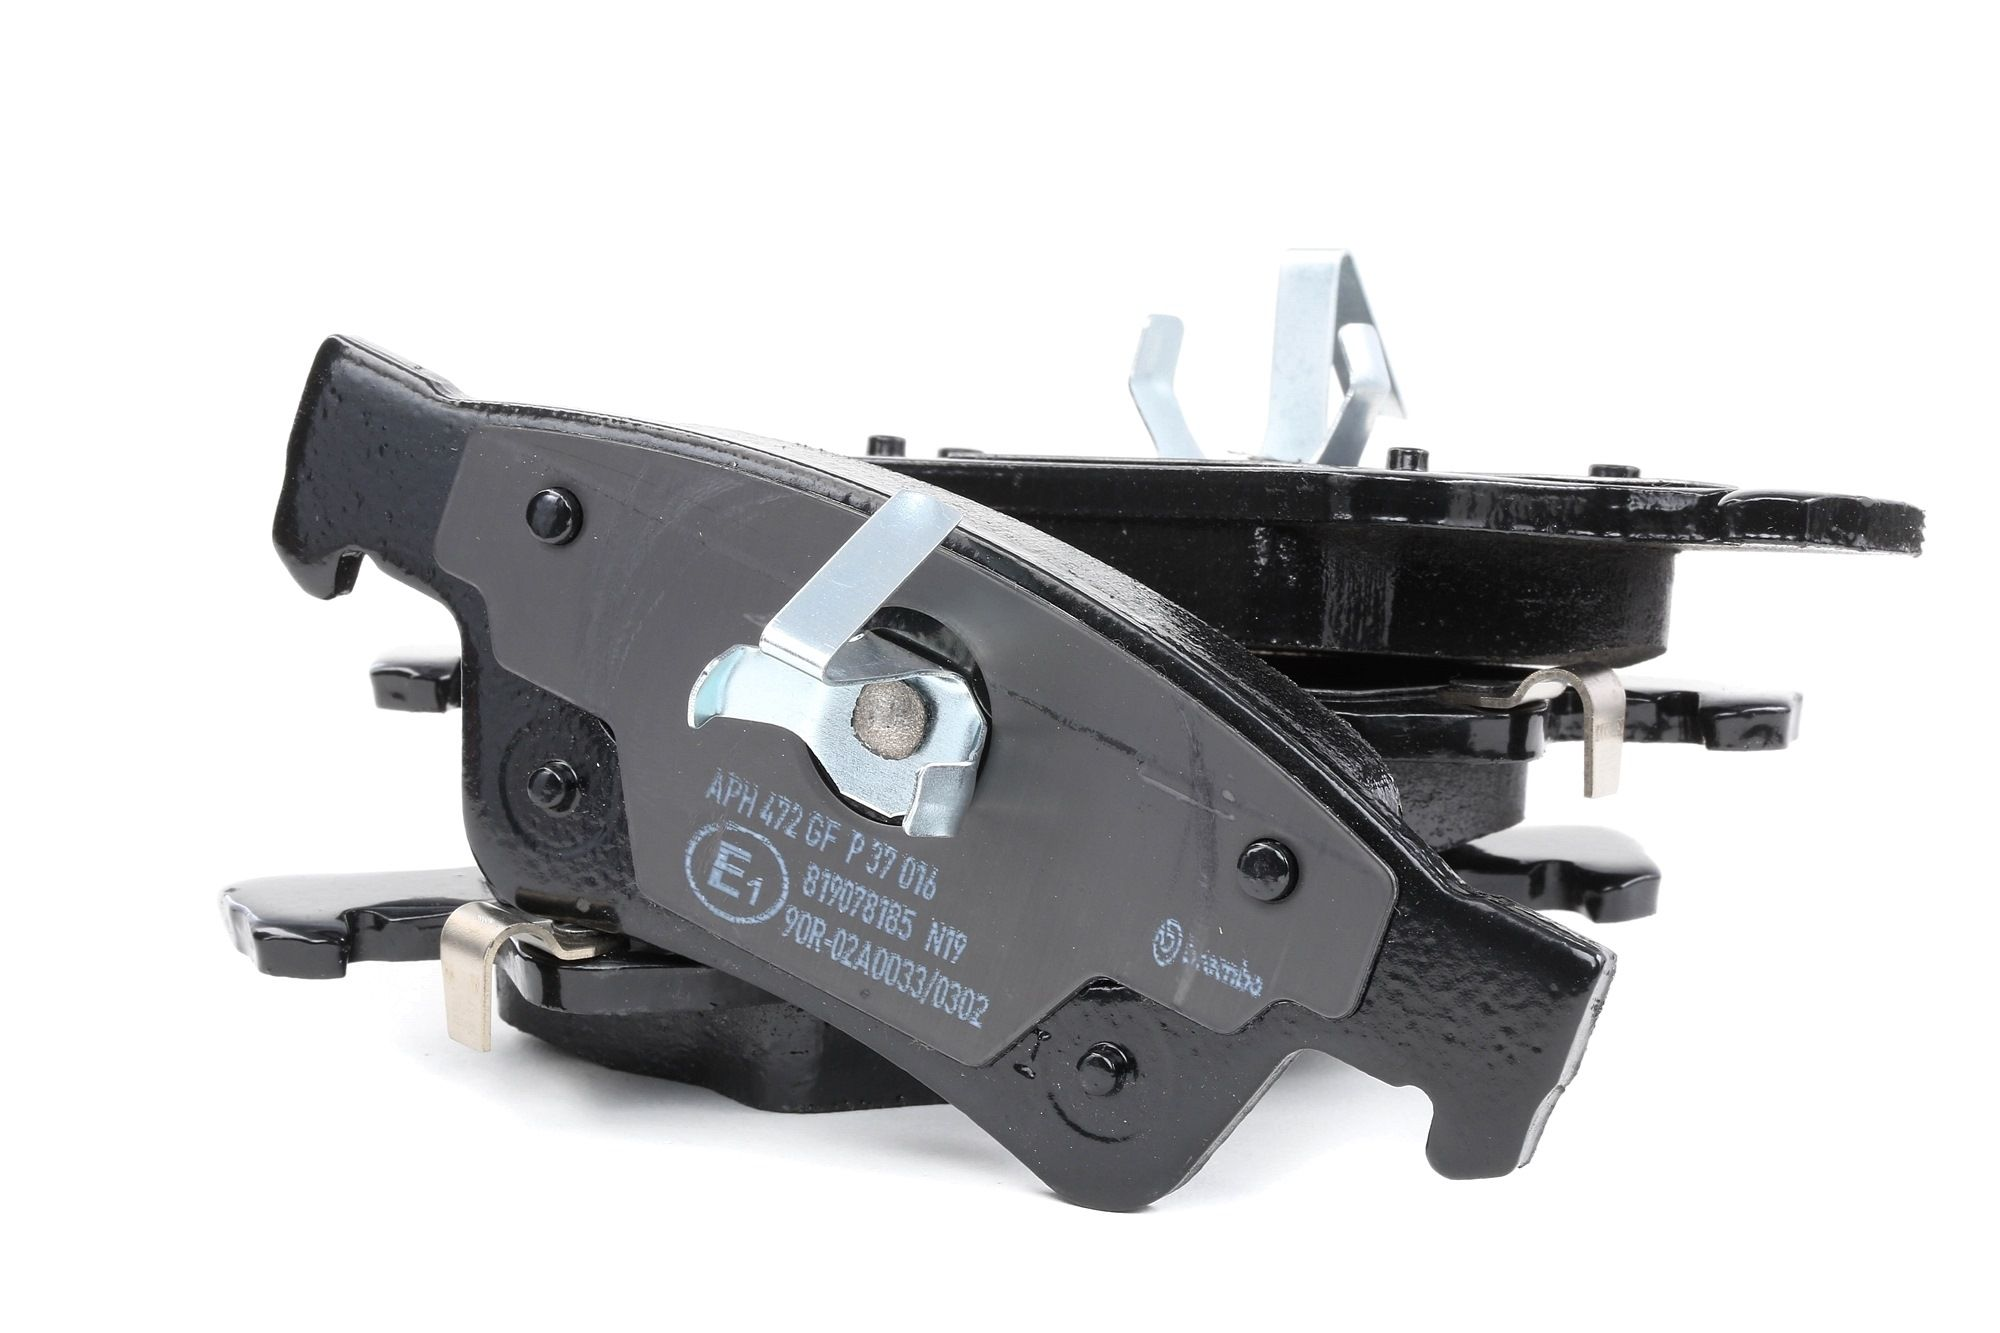 DODGE DURANGO 2020 Bremsbelagsatz - Original BREMBO P 37 016 Höhe 1: 51,8mm, Höhe 2: 59,6mm, Breite 1: 140,1mm, Breite 2: 141,4mm, Dicke/Stärke: 18mm